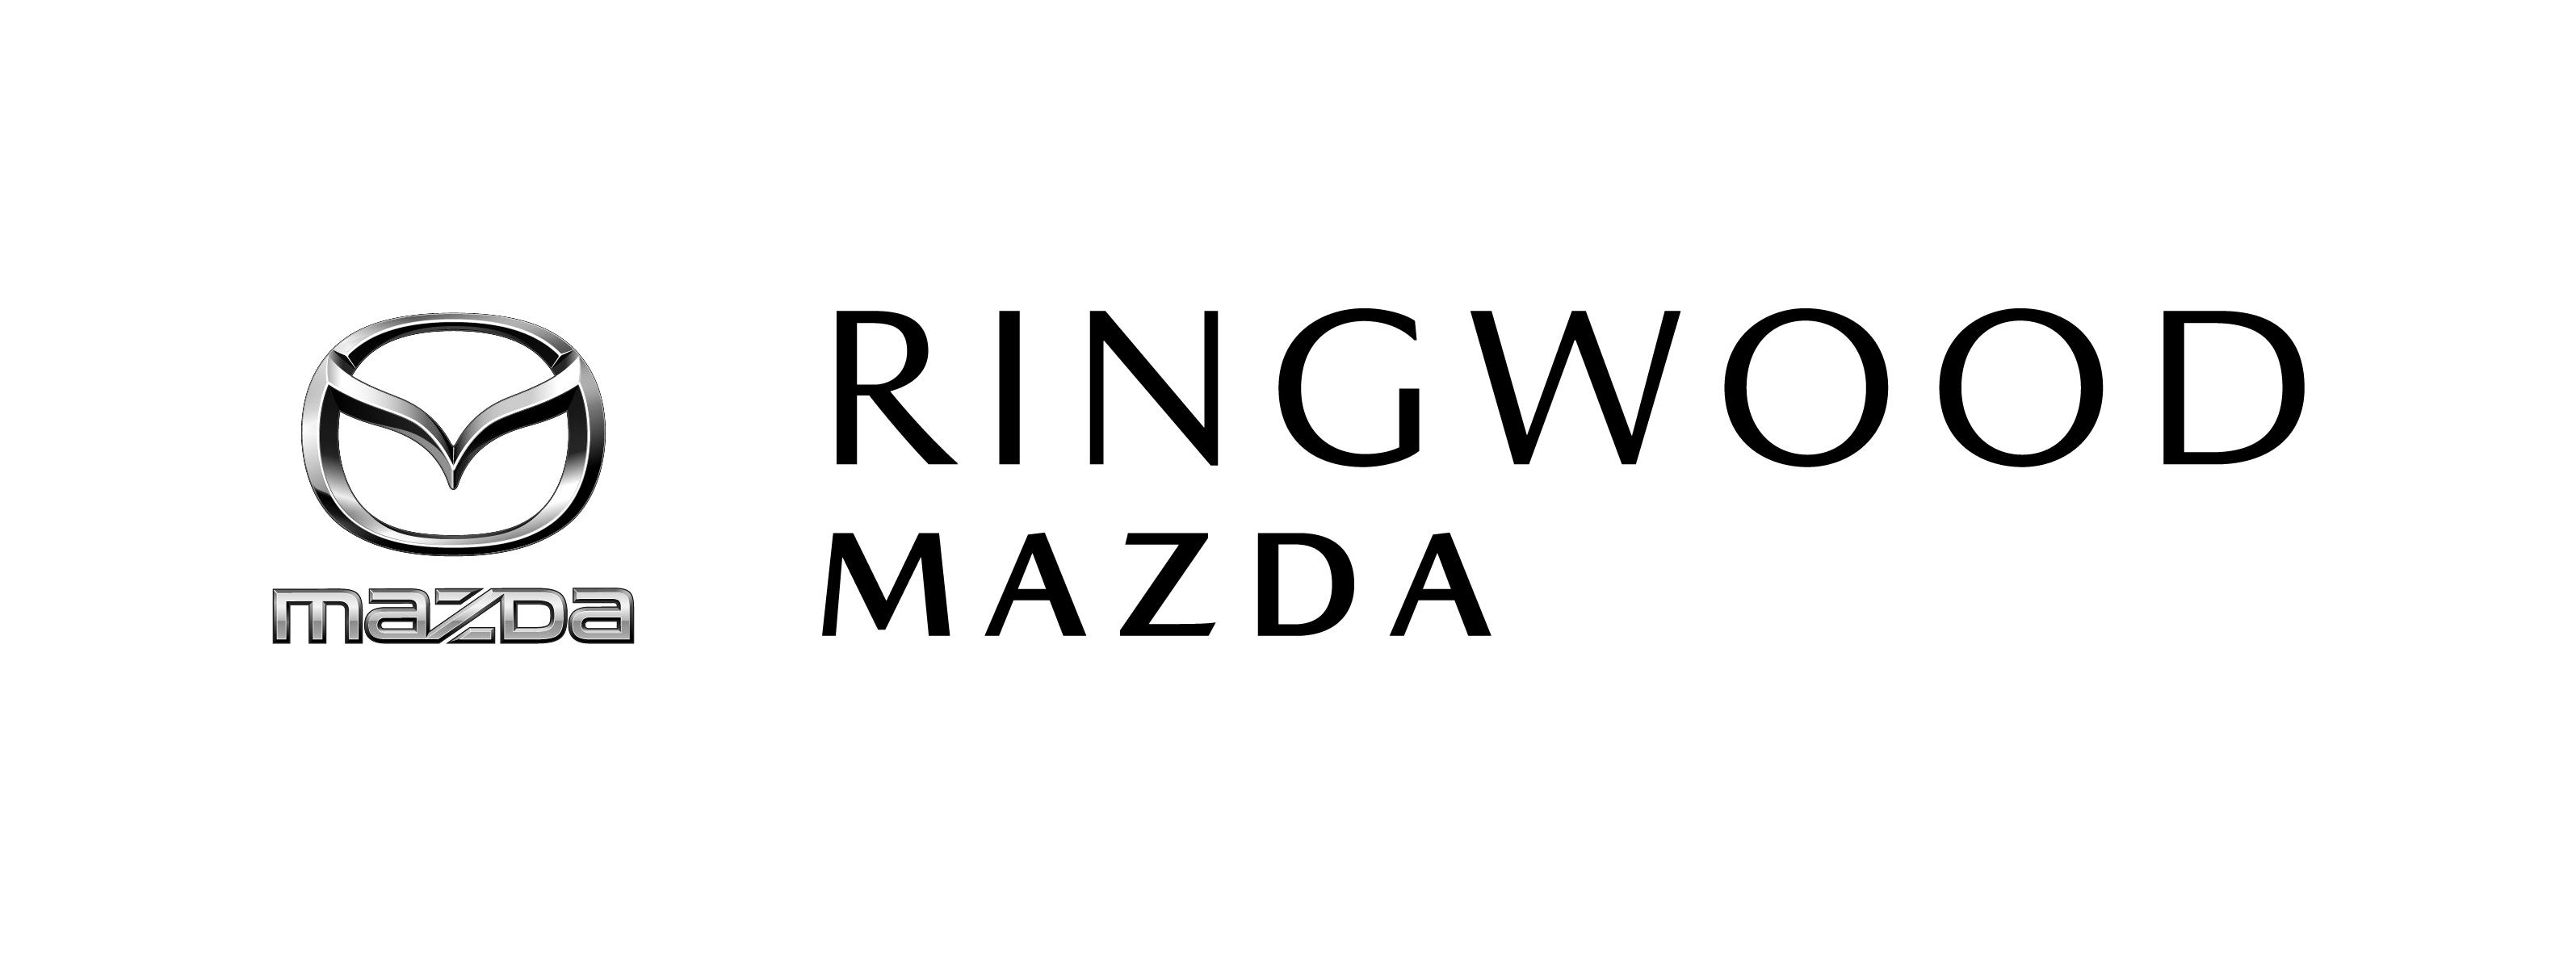 Ringwood Mazda Logo 2019 Cmyk